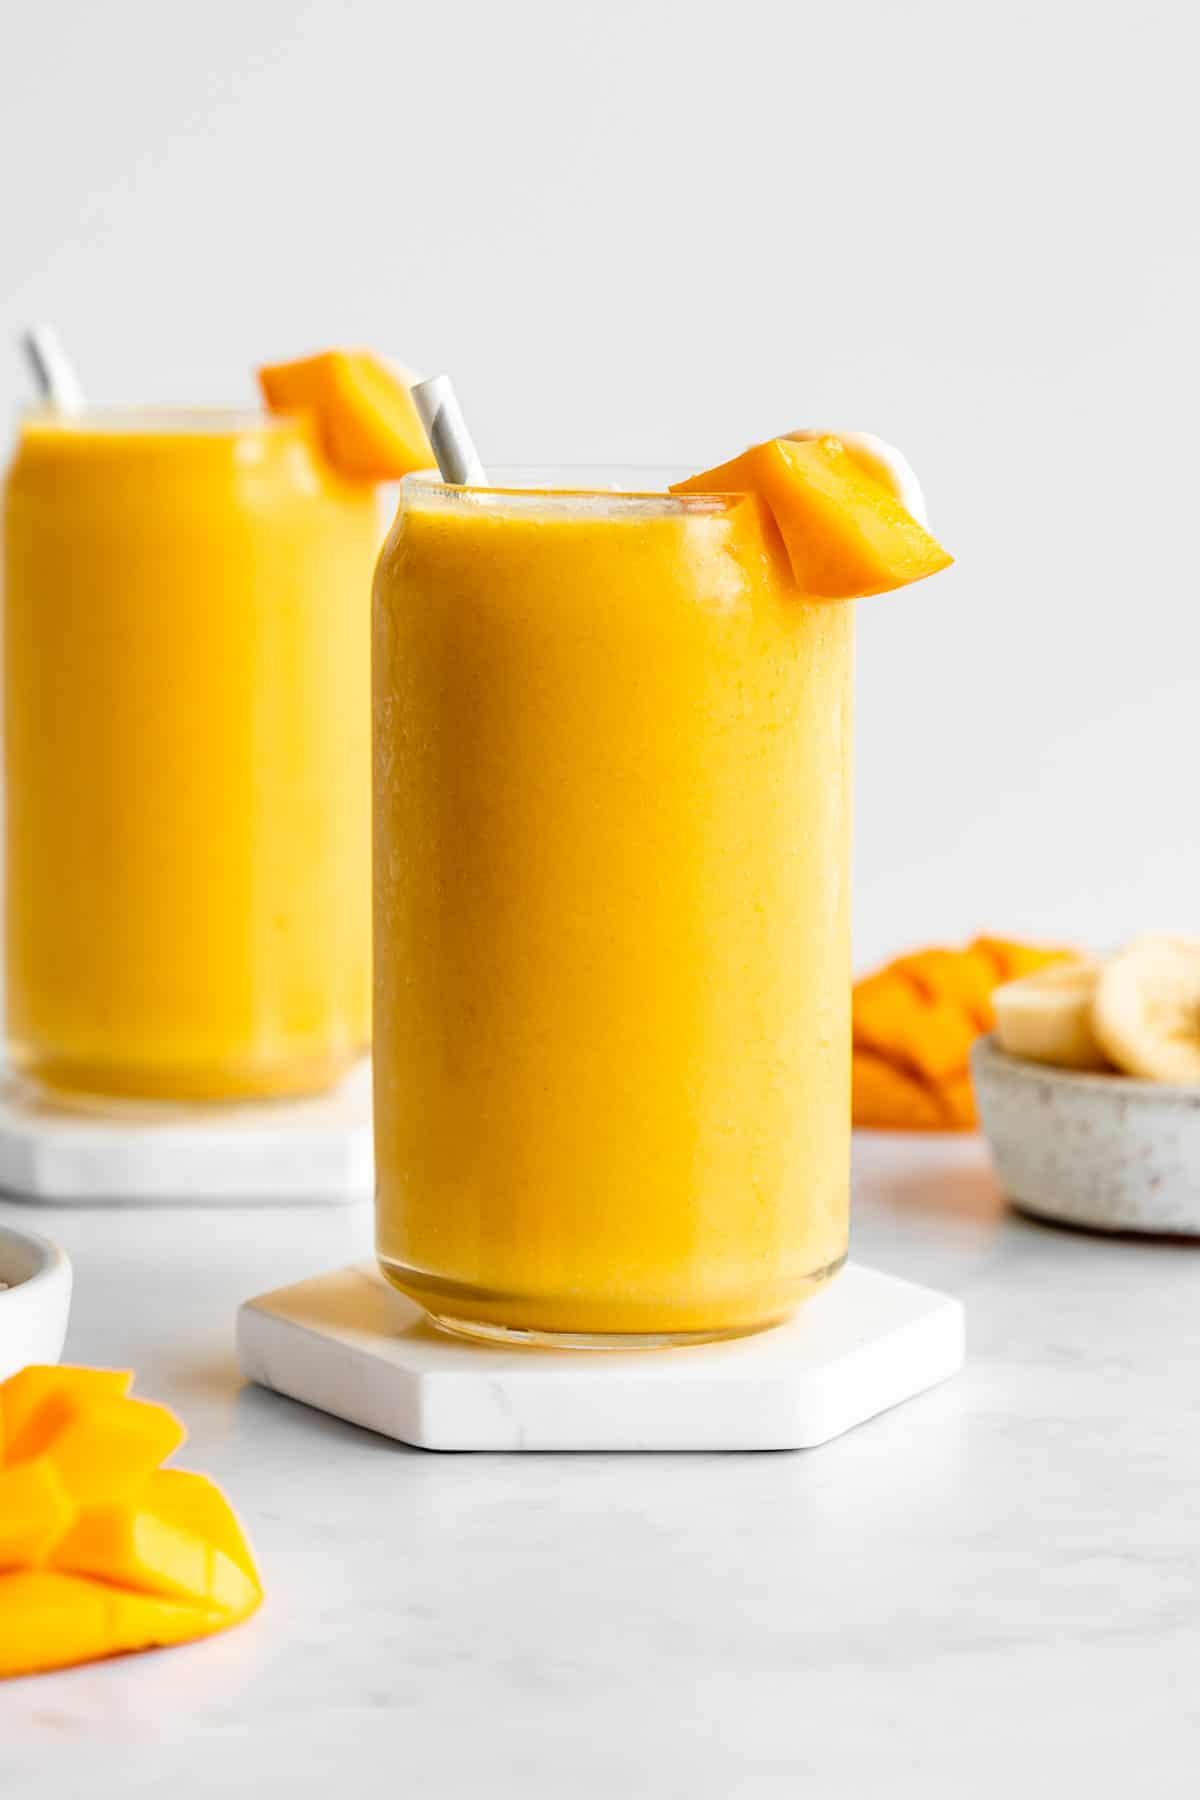 mango banana smoothie inside two glasses